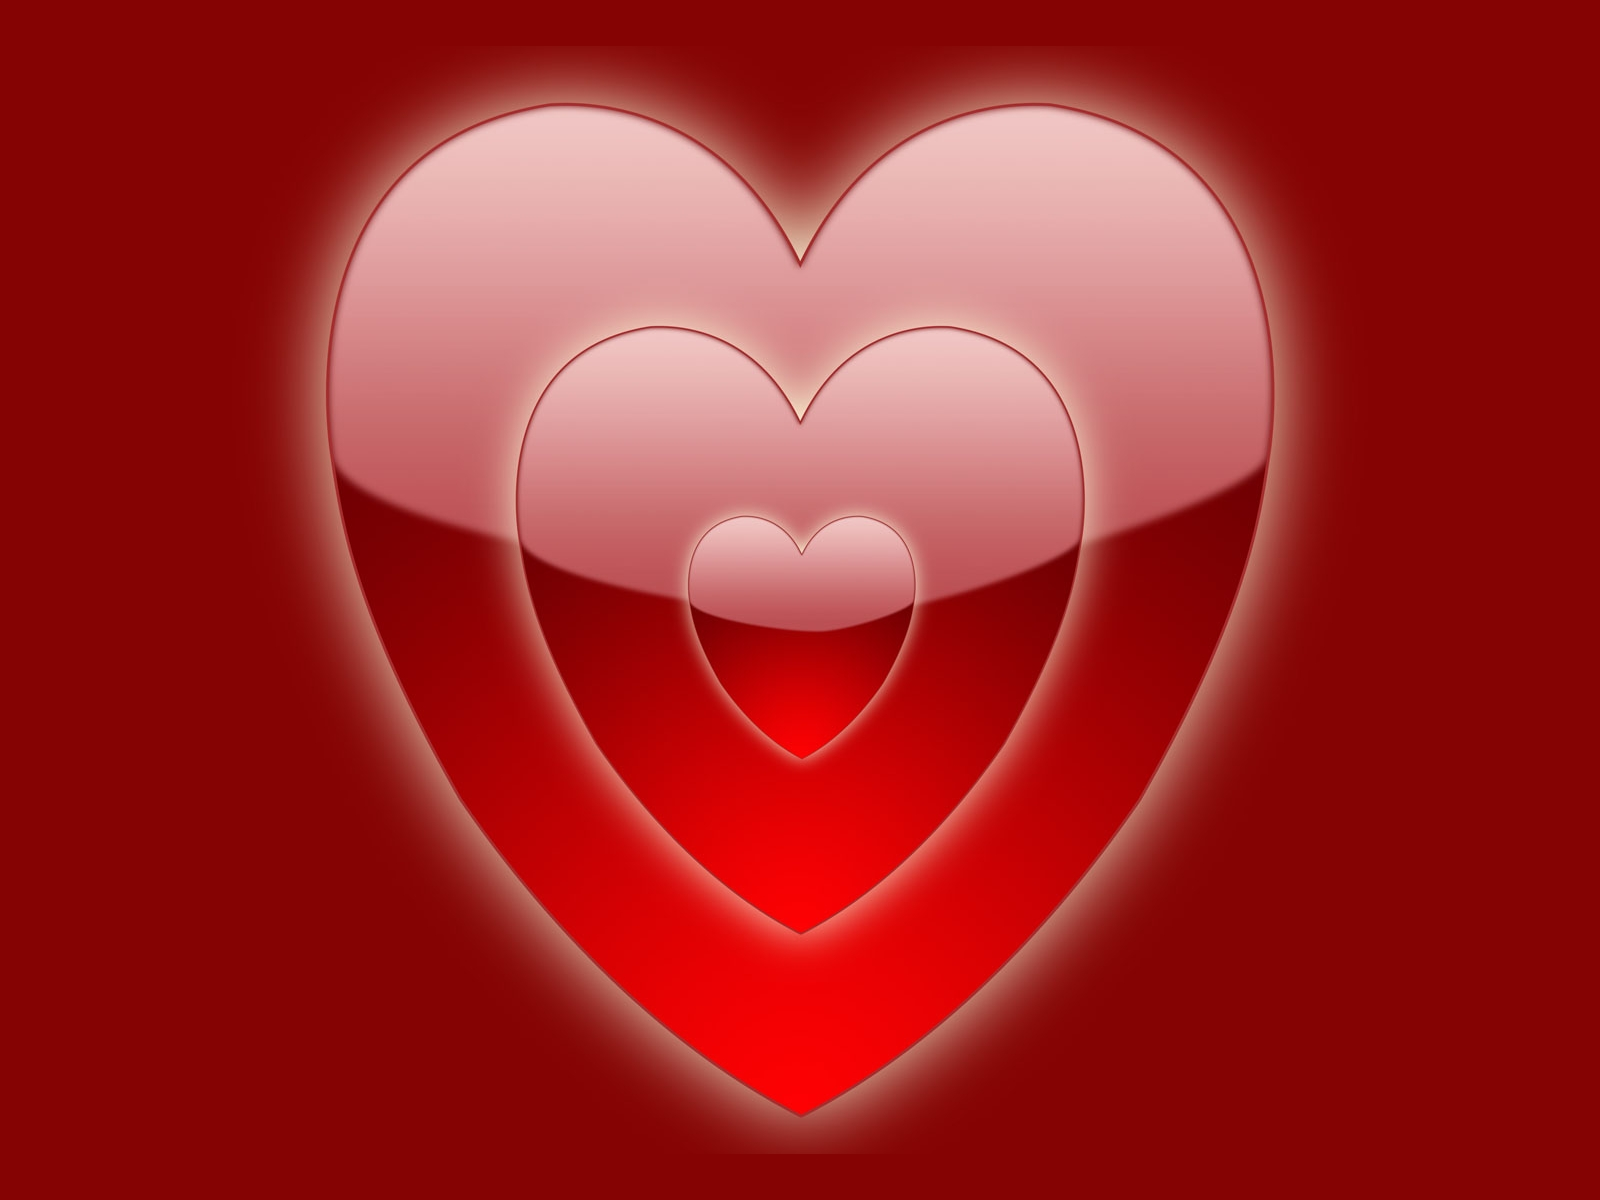 Desktop backgrounds 4u valentine - Heart to heart wallpaper ...